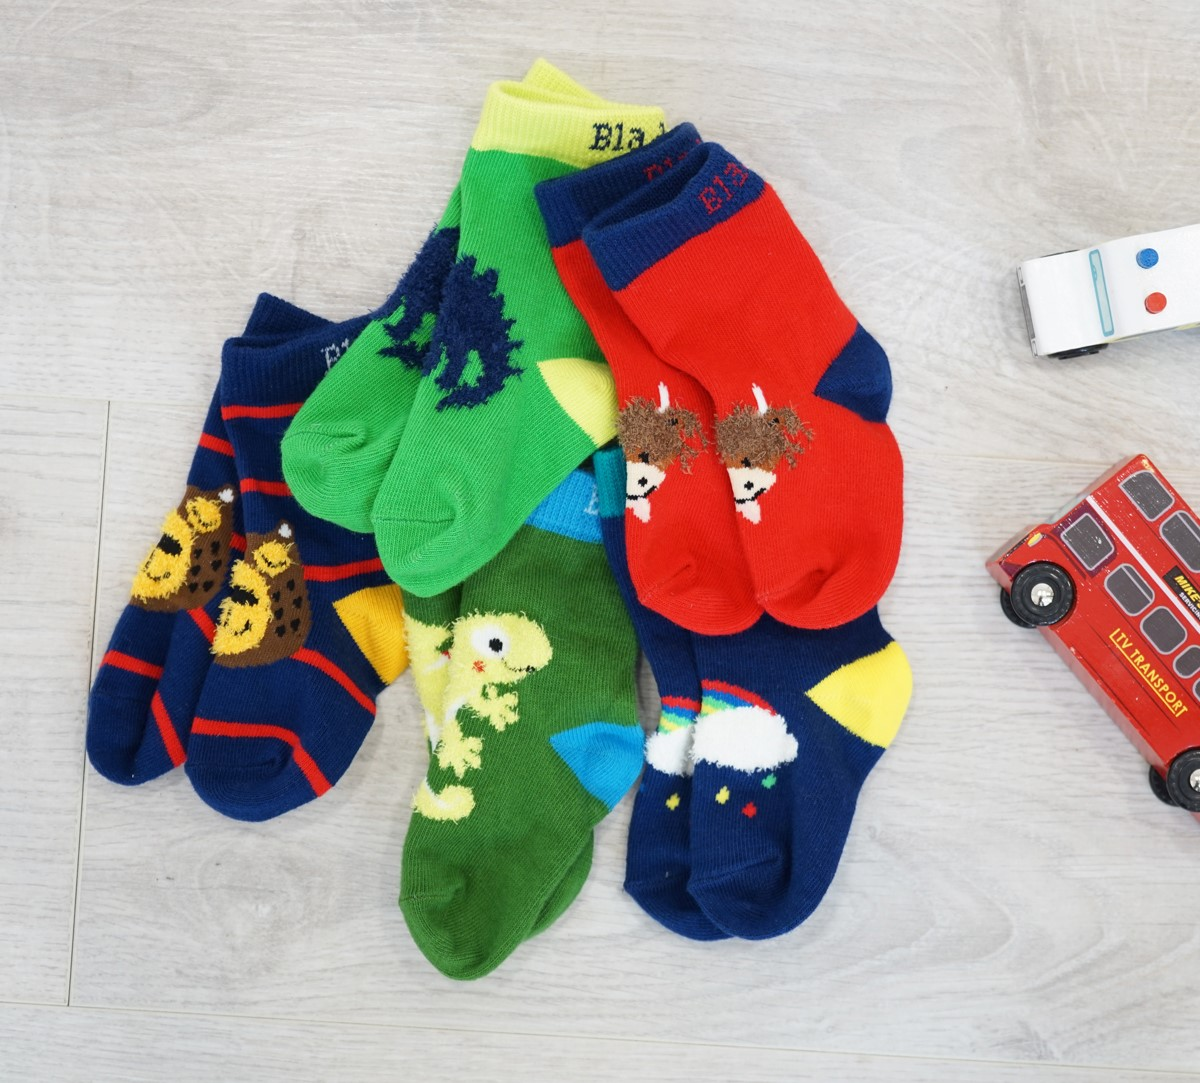 side-of-5pk-socks-pack-option-1-no-box